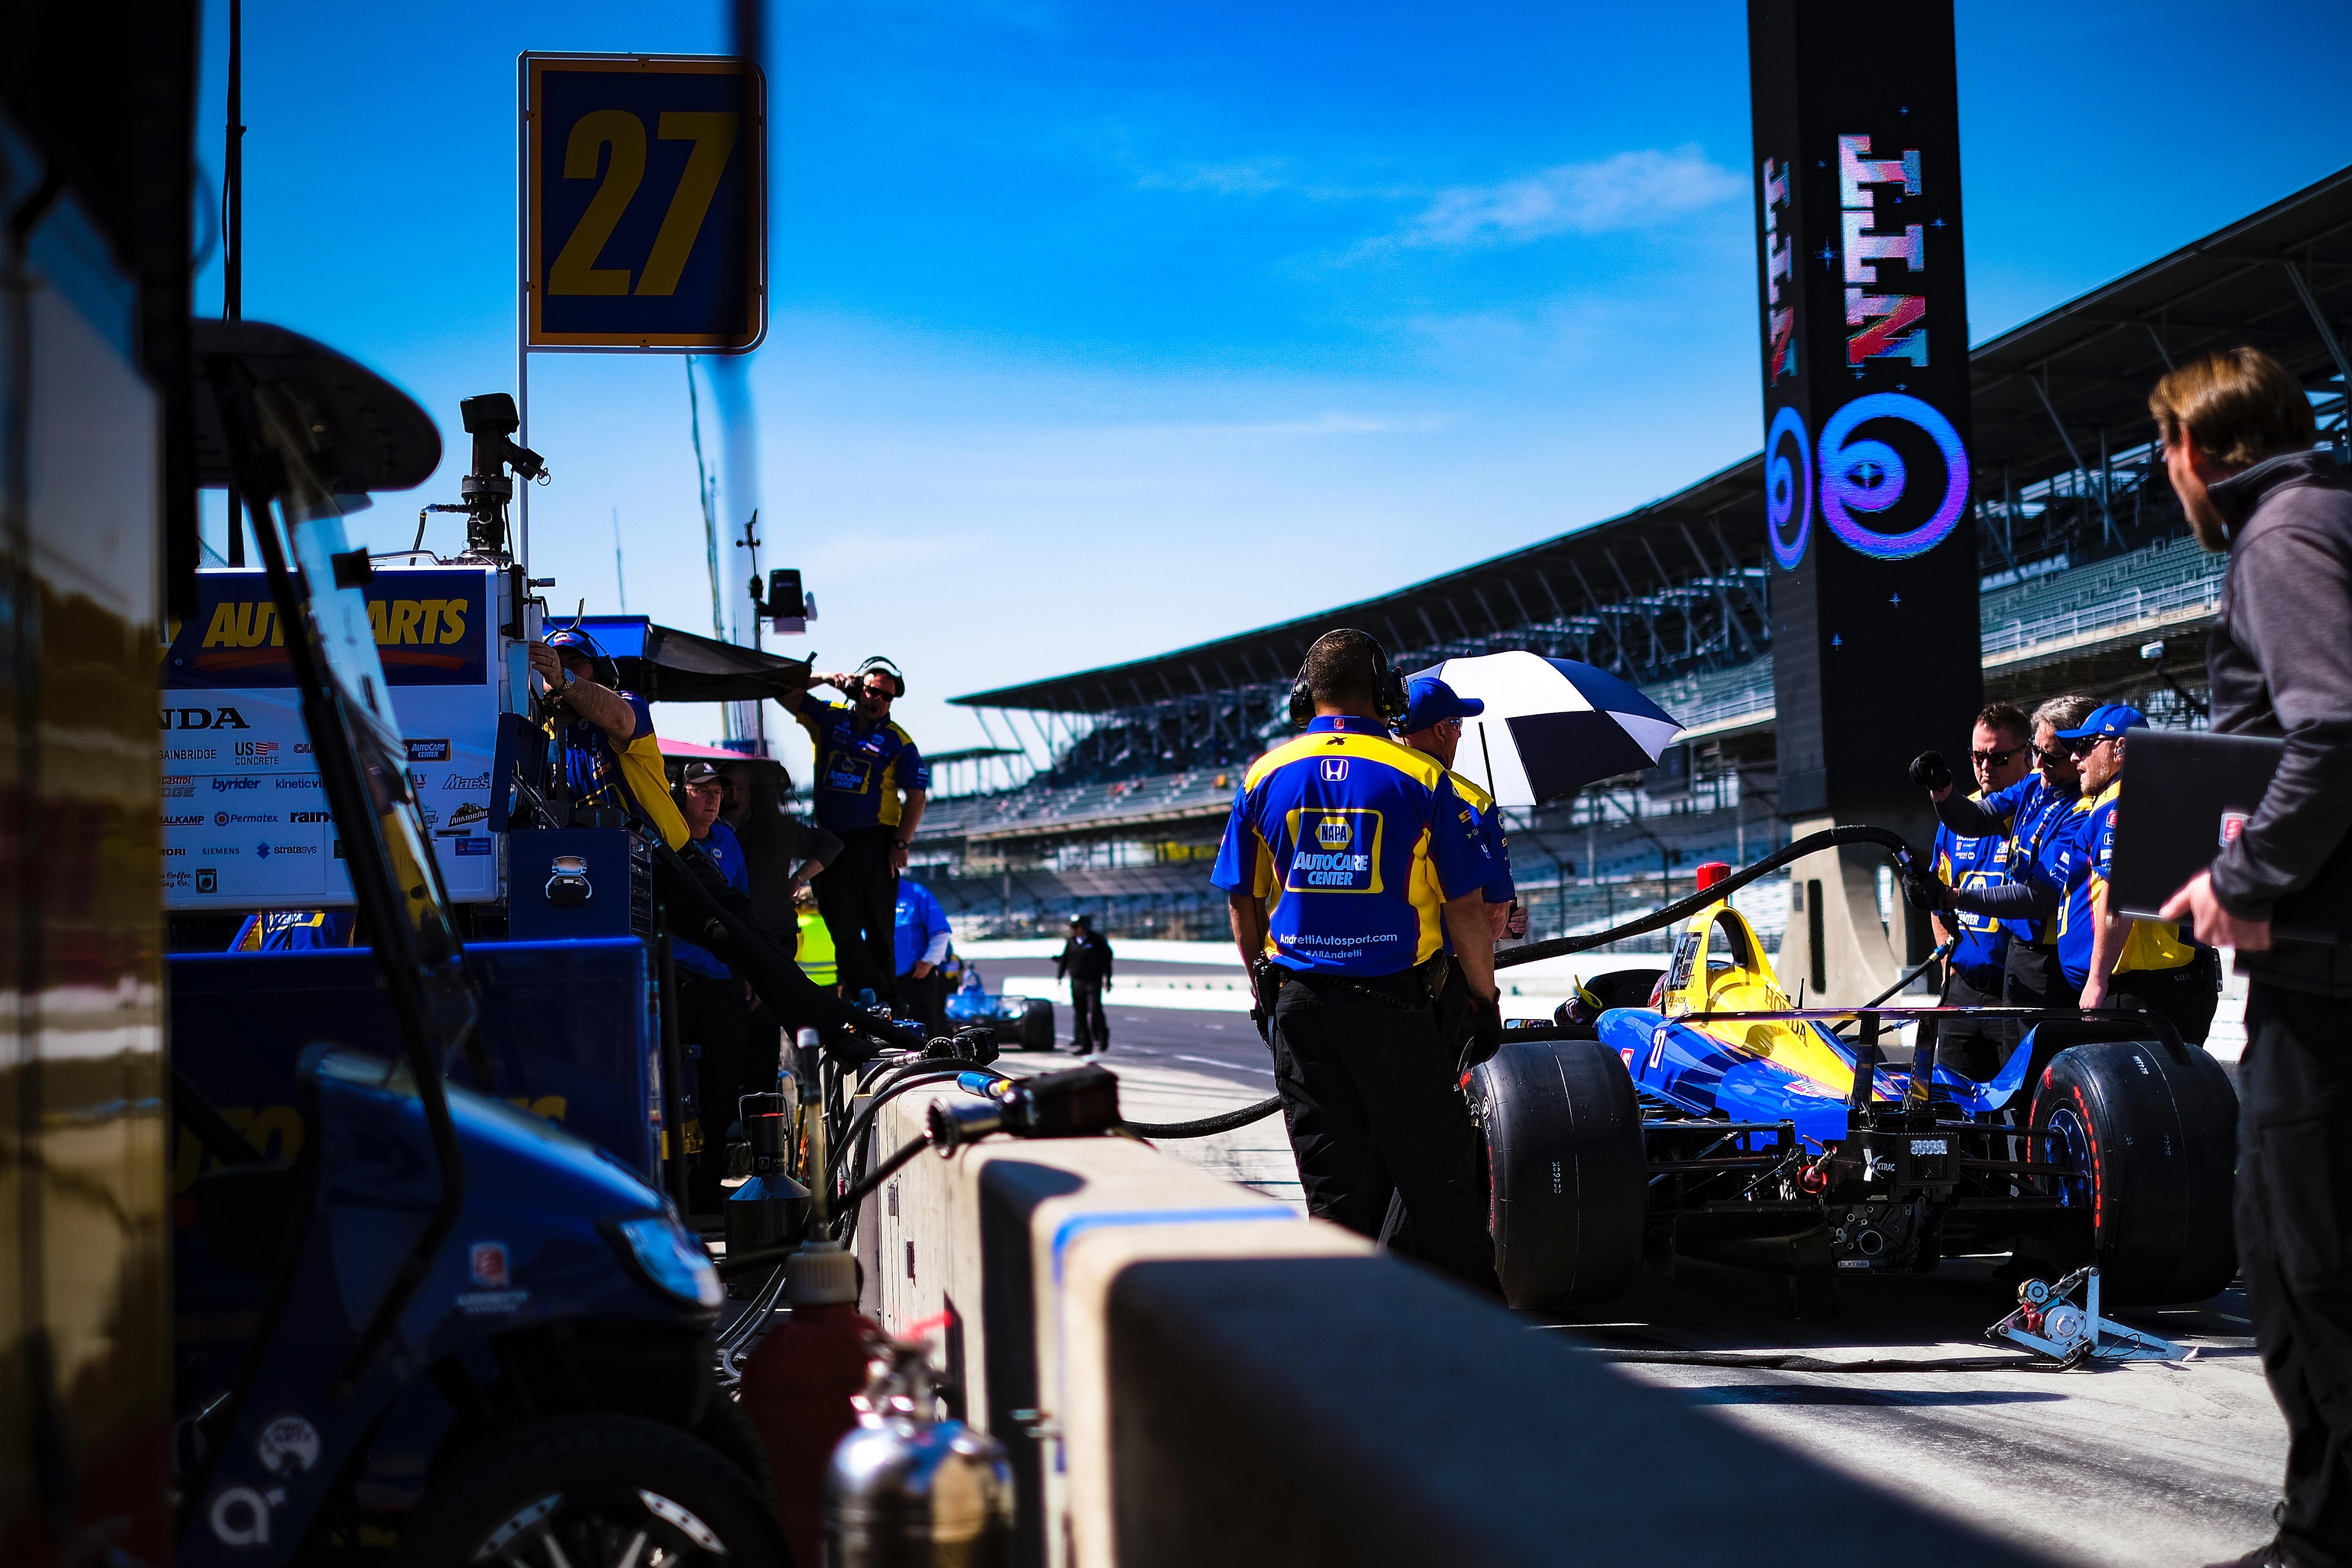 Indianapolis 500 practice 2019